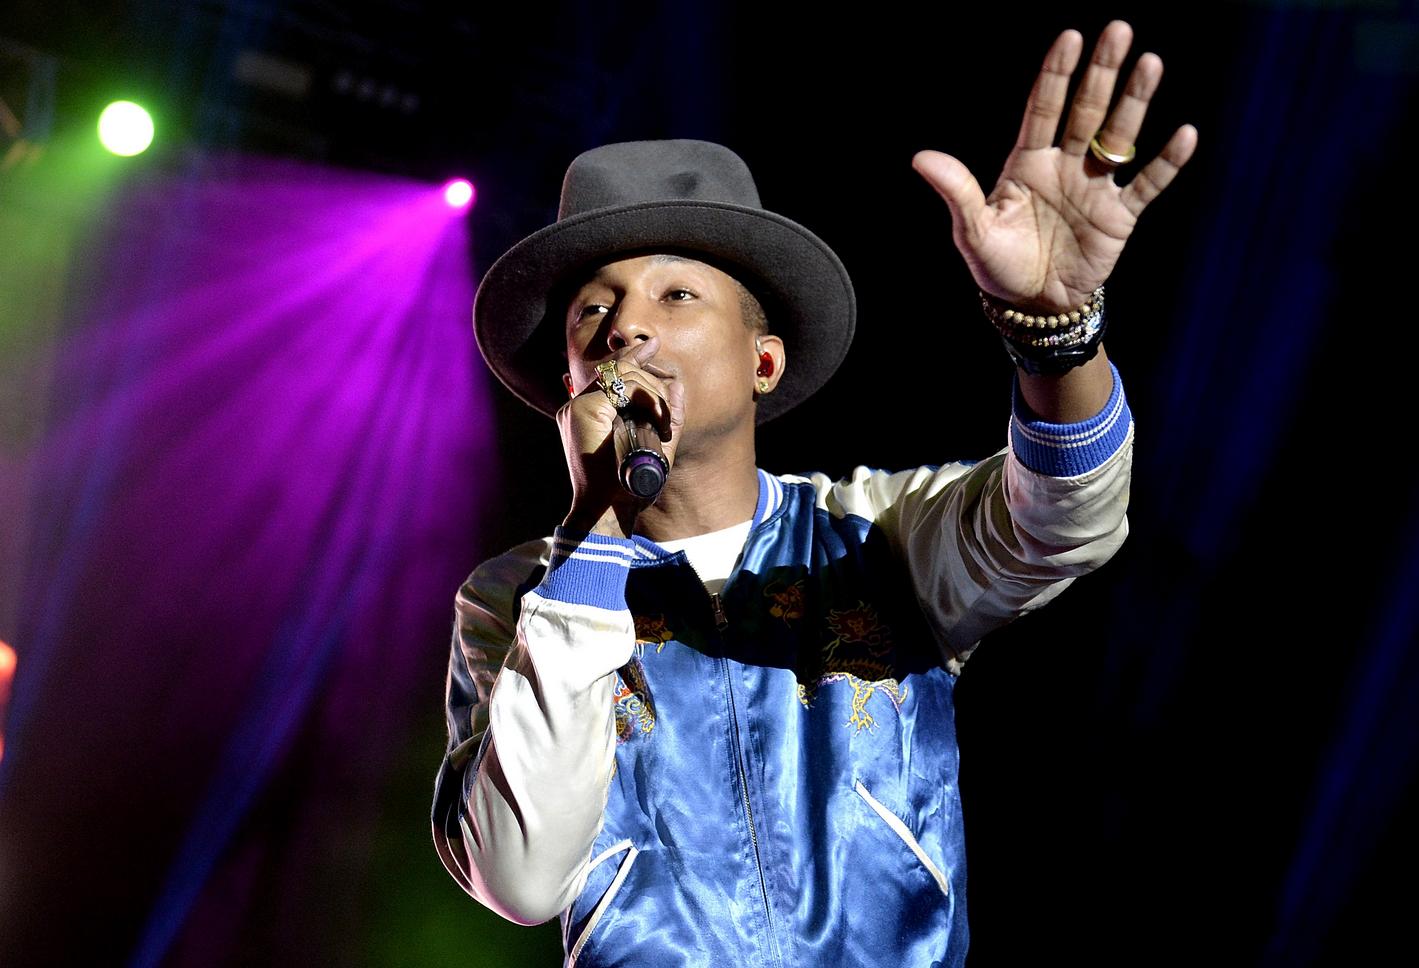 Pharrell Williams Live Concert In Seoul